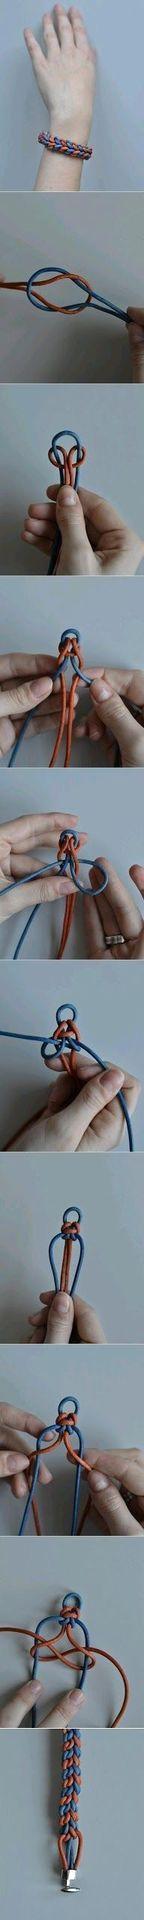 Bracelet Braid - Tutorial